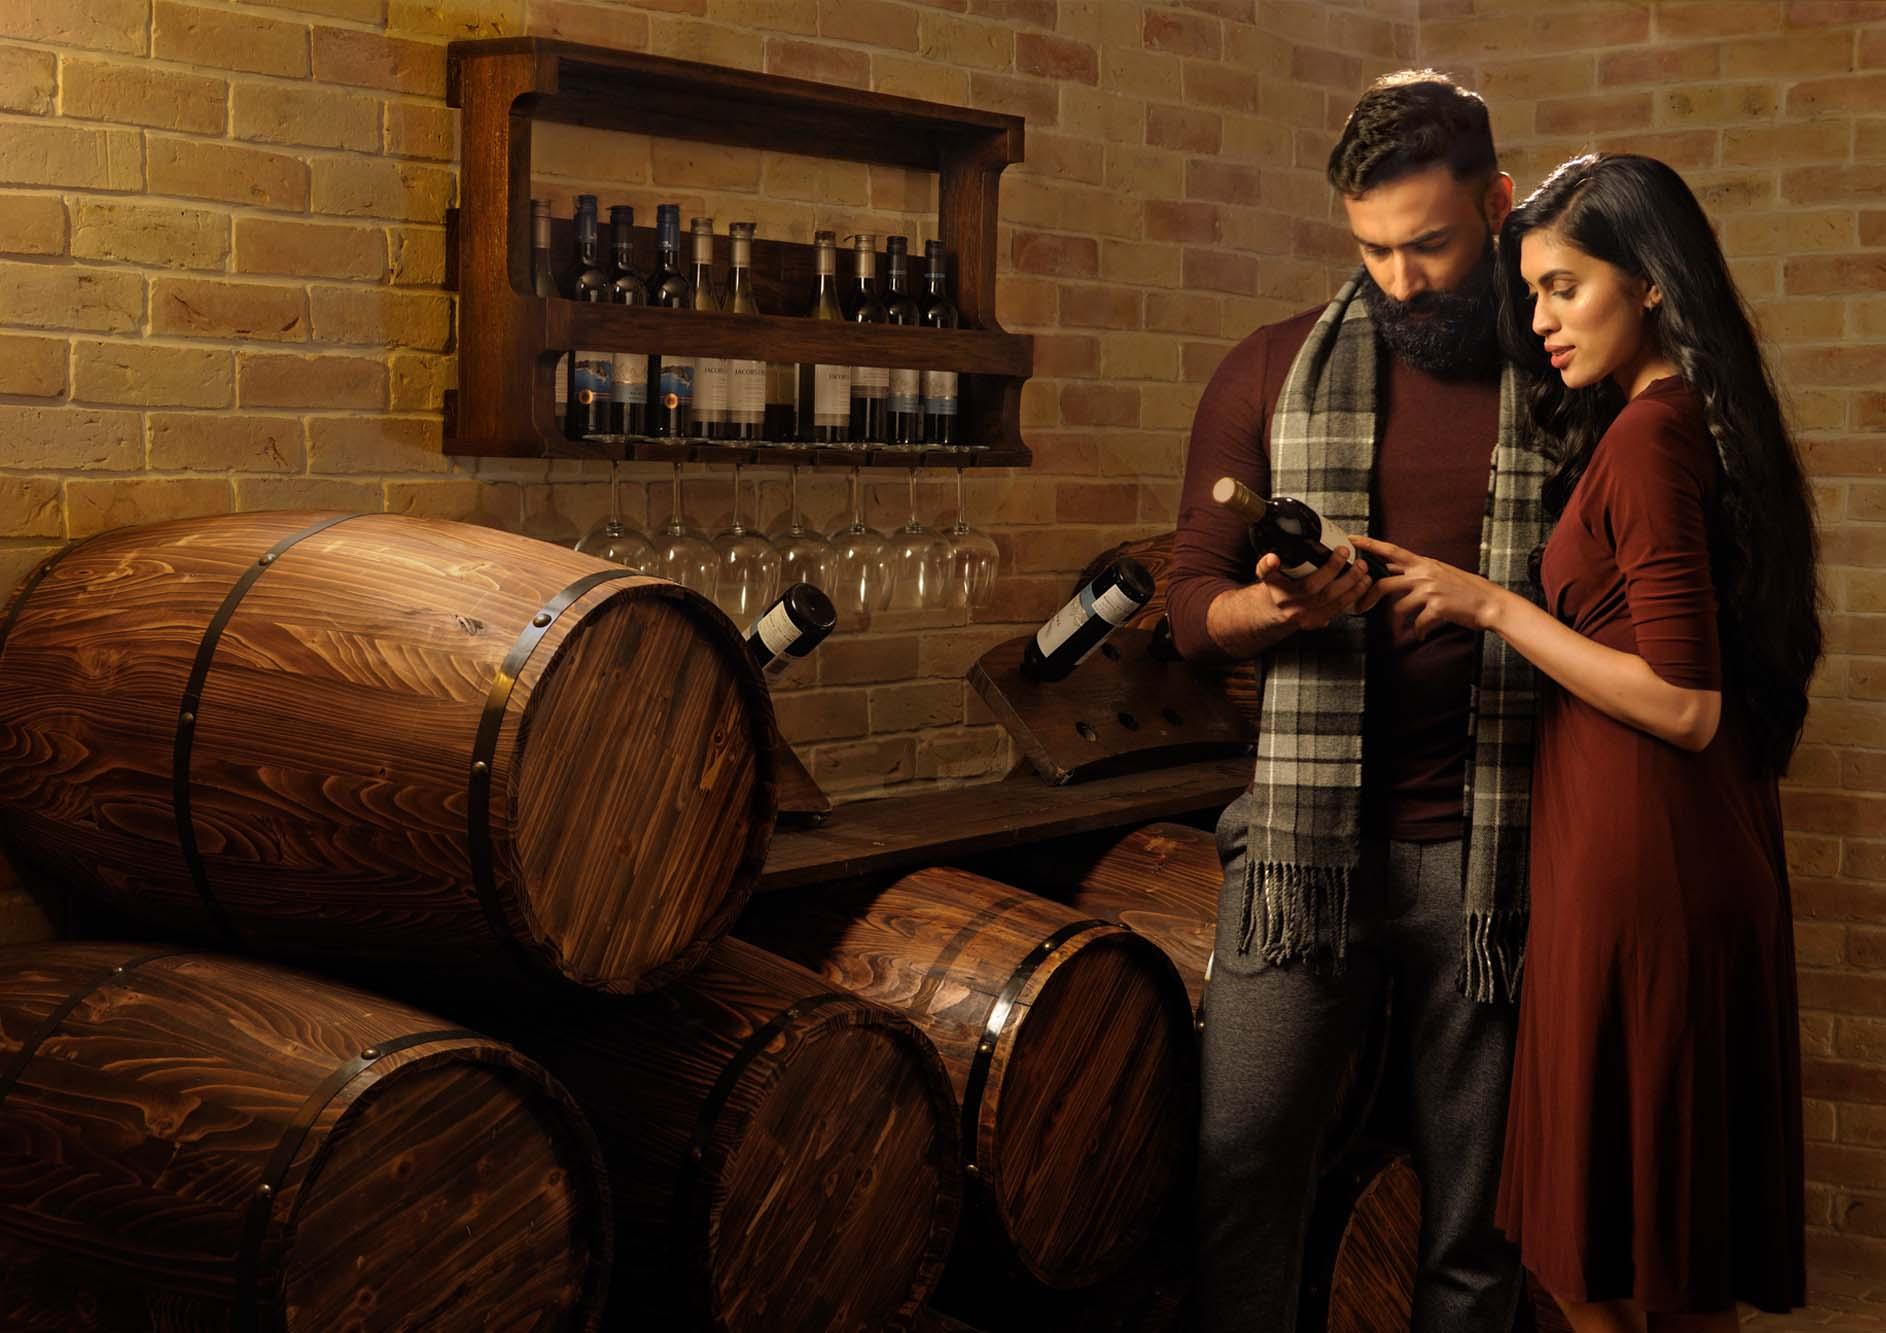 Beautiful-young-couple-is-talking-while-choosing-wine-at-the-tamara-kodai